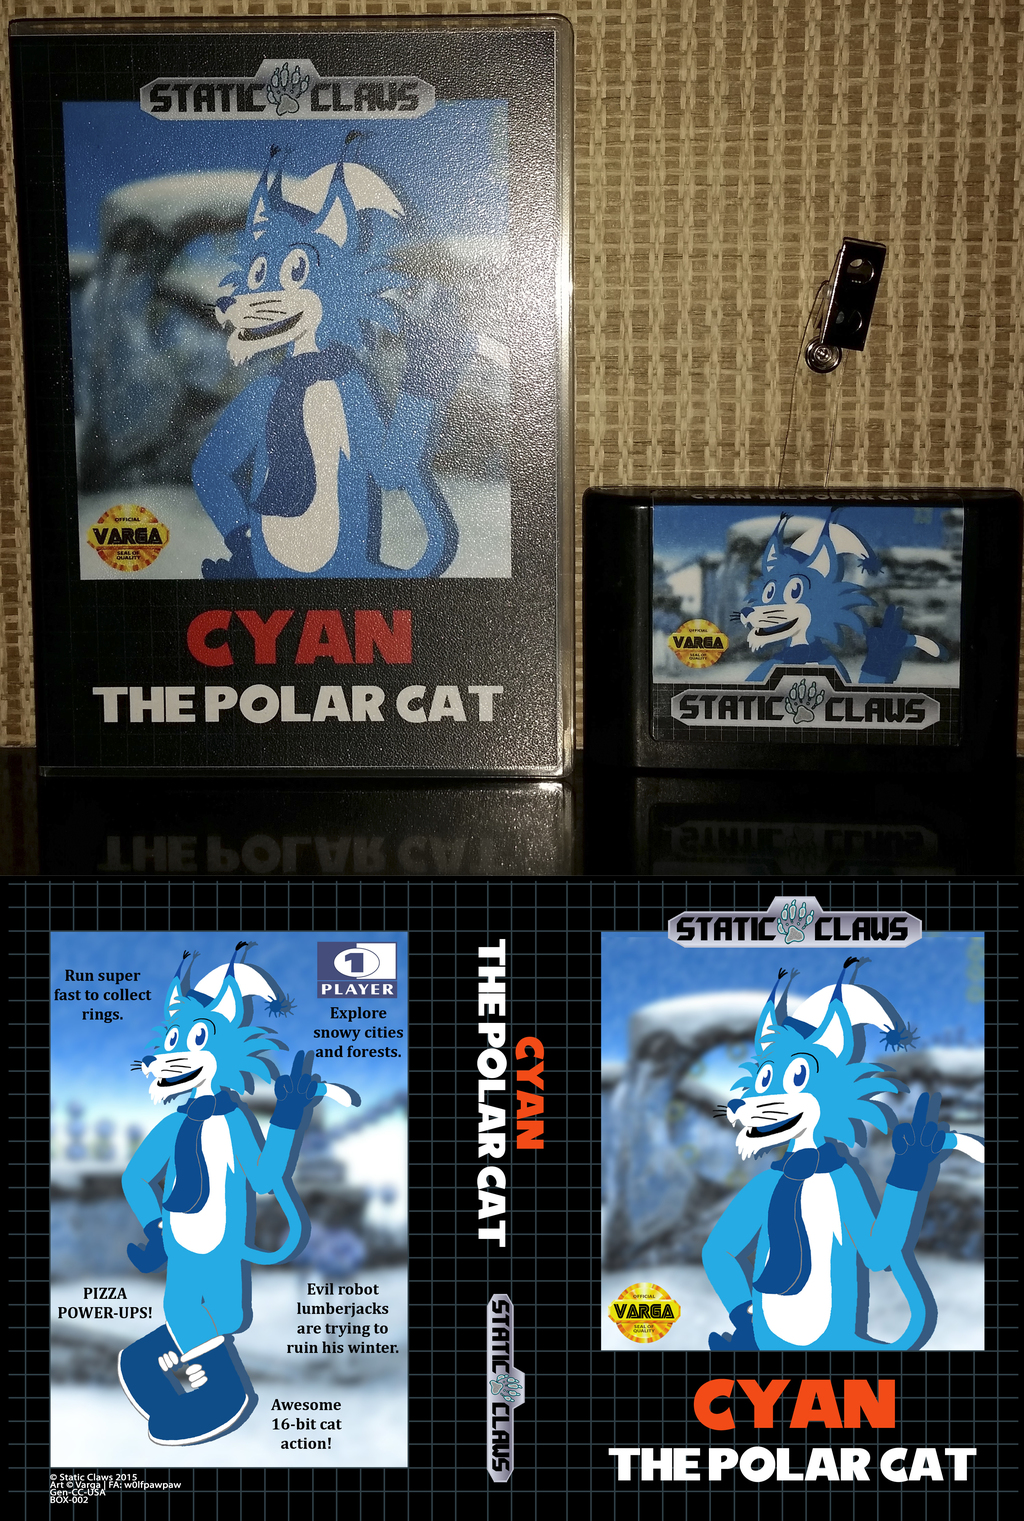 Cyan the Polar Cat [cartridge badge]